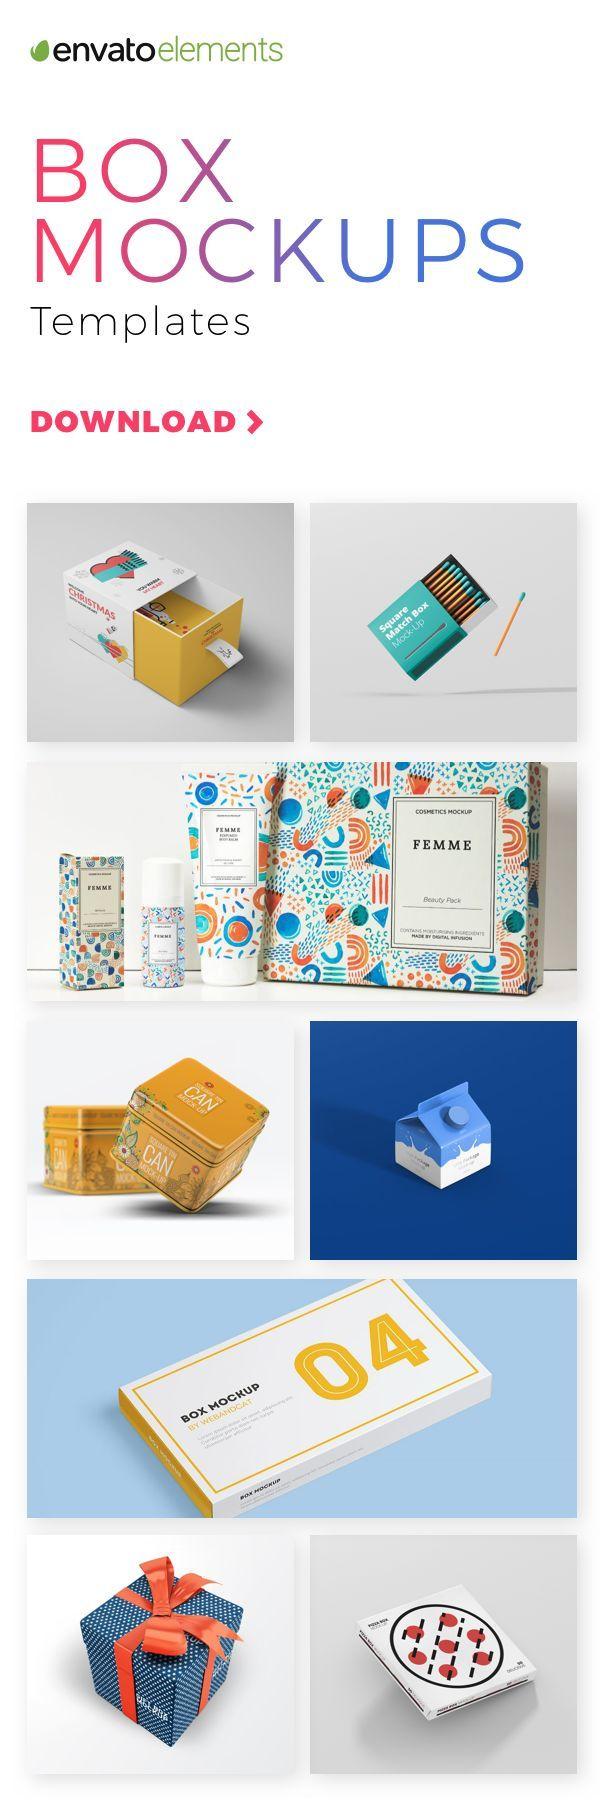 Unlimited Downloads Of 2018 S Best Box Mockups Box Mockup Box Design Box Template